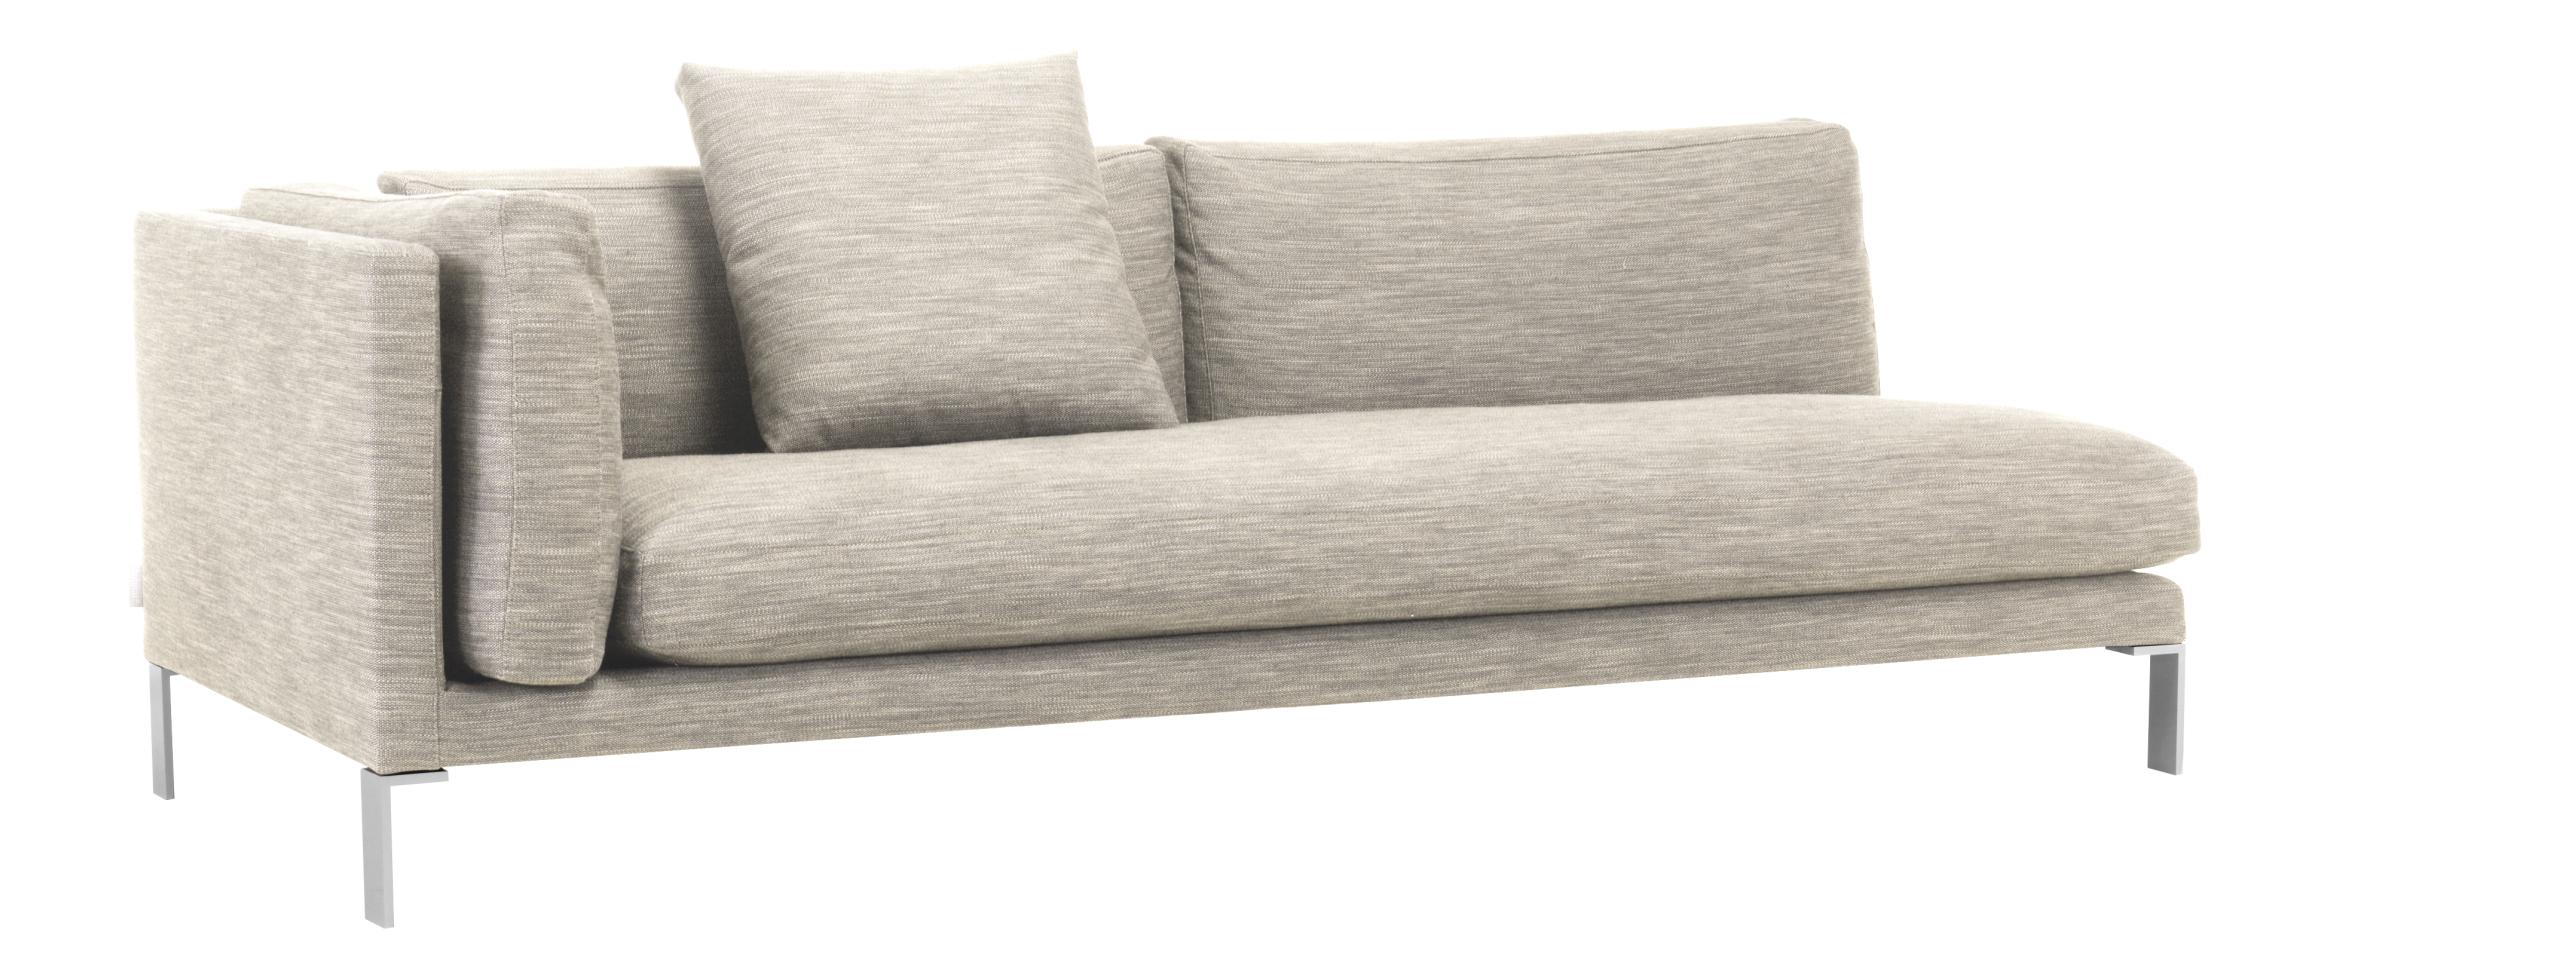 Newman Sofas 3 Seat Sofa Ecru Fabric Mobilier De Salon Canape 3